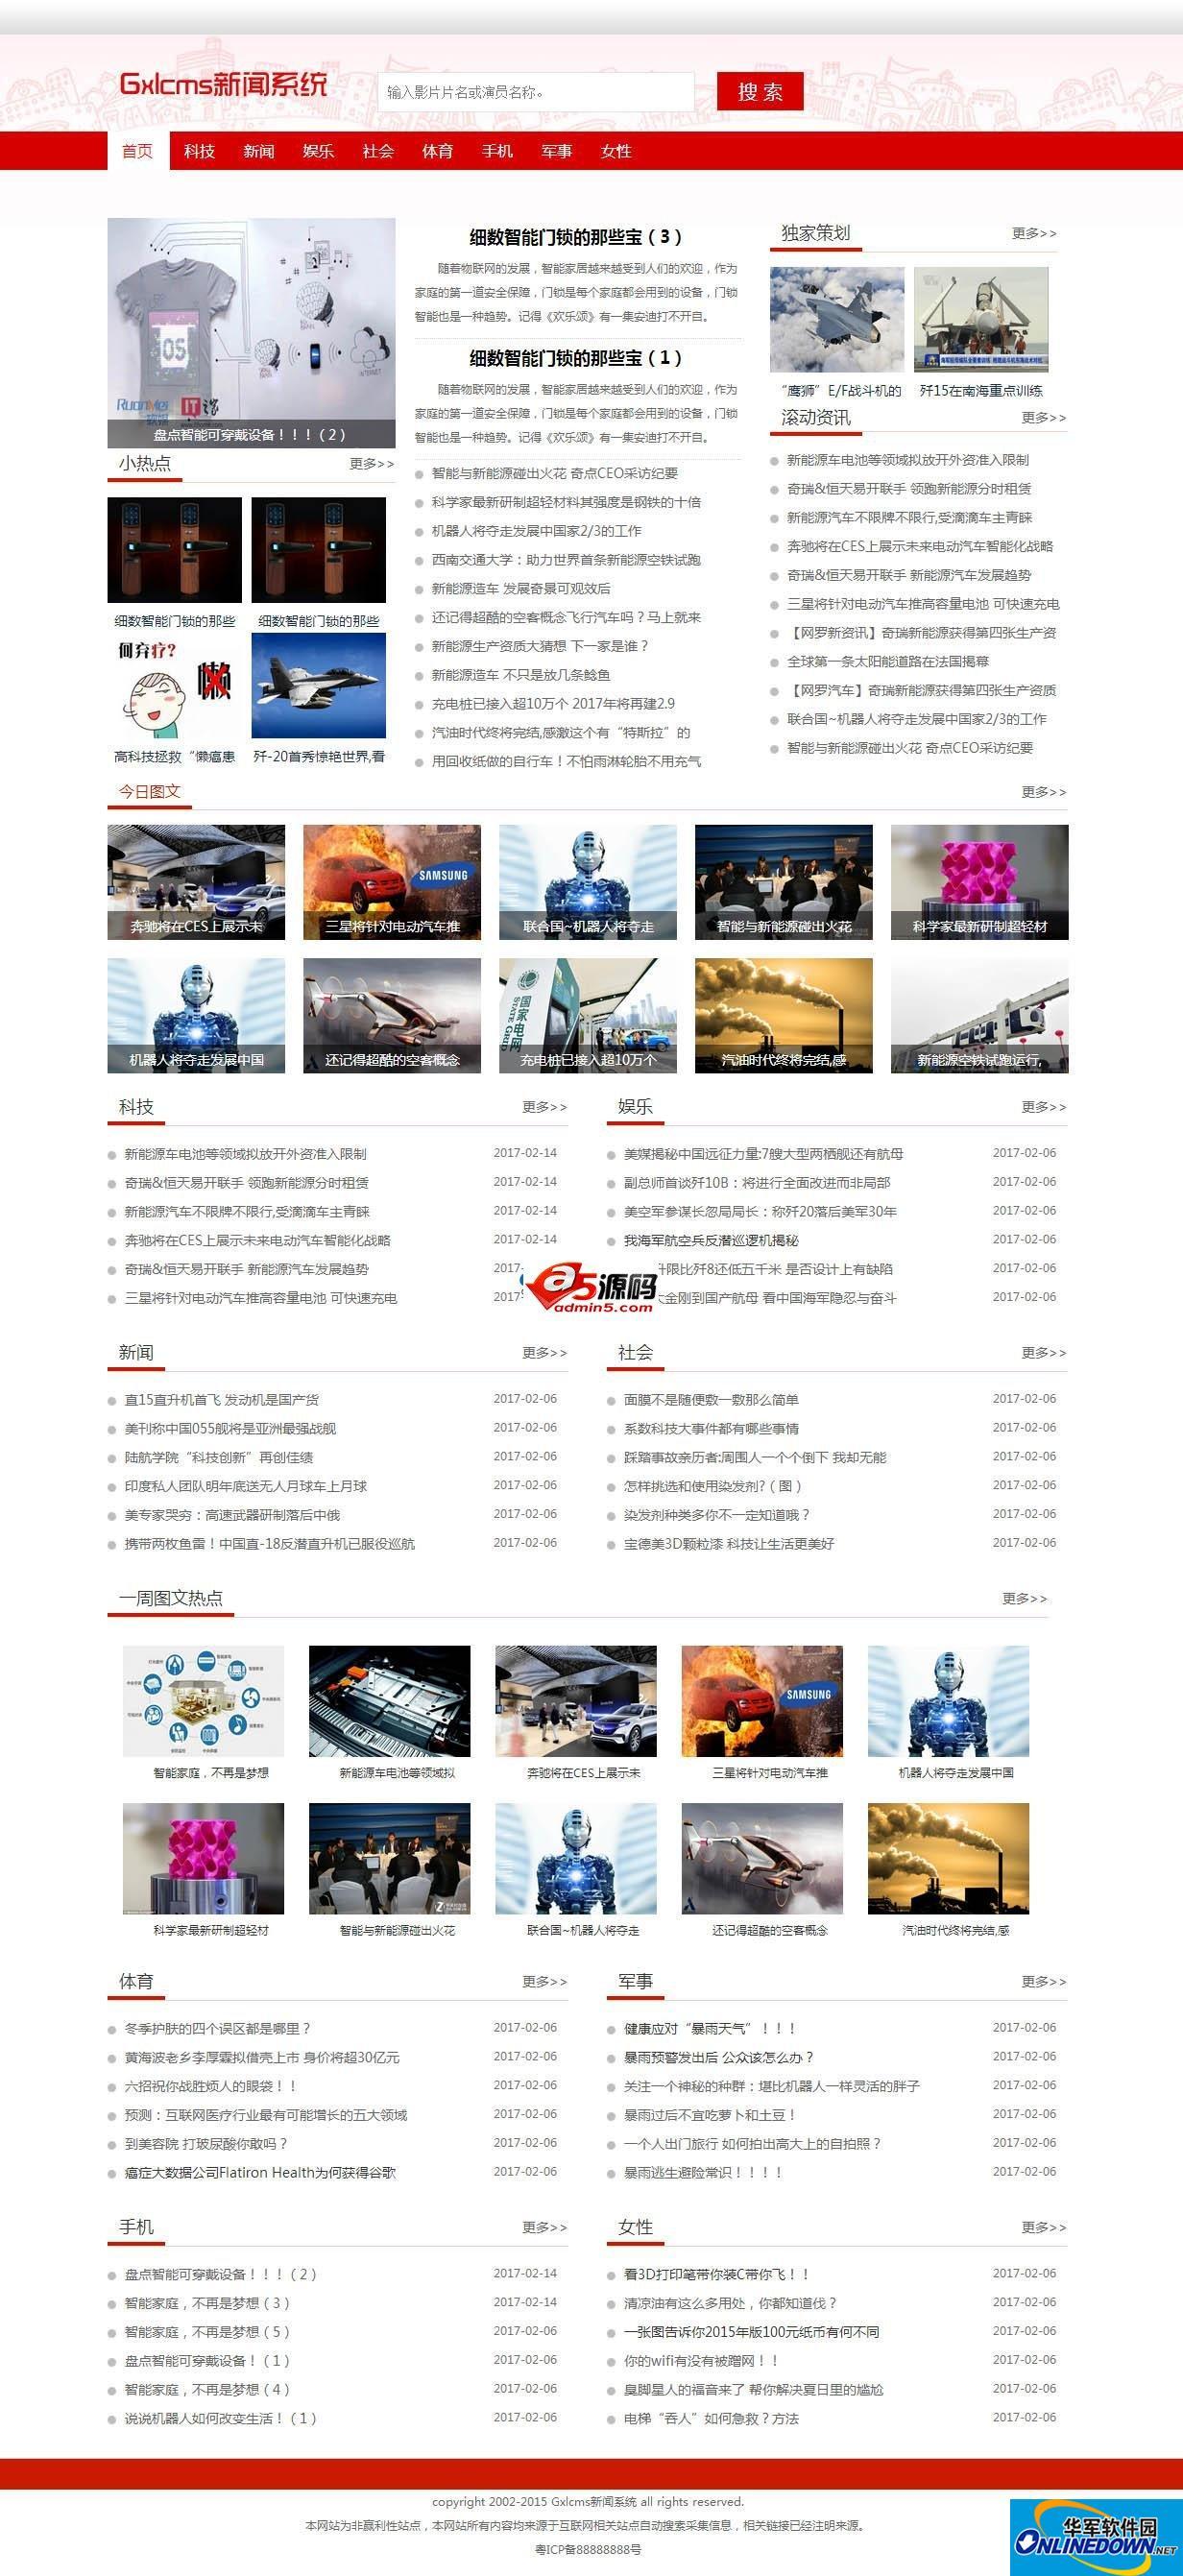 Gxlcms新闻系统(新闻类cms)